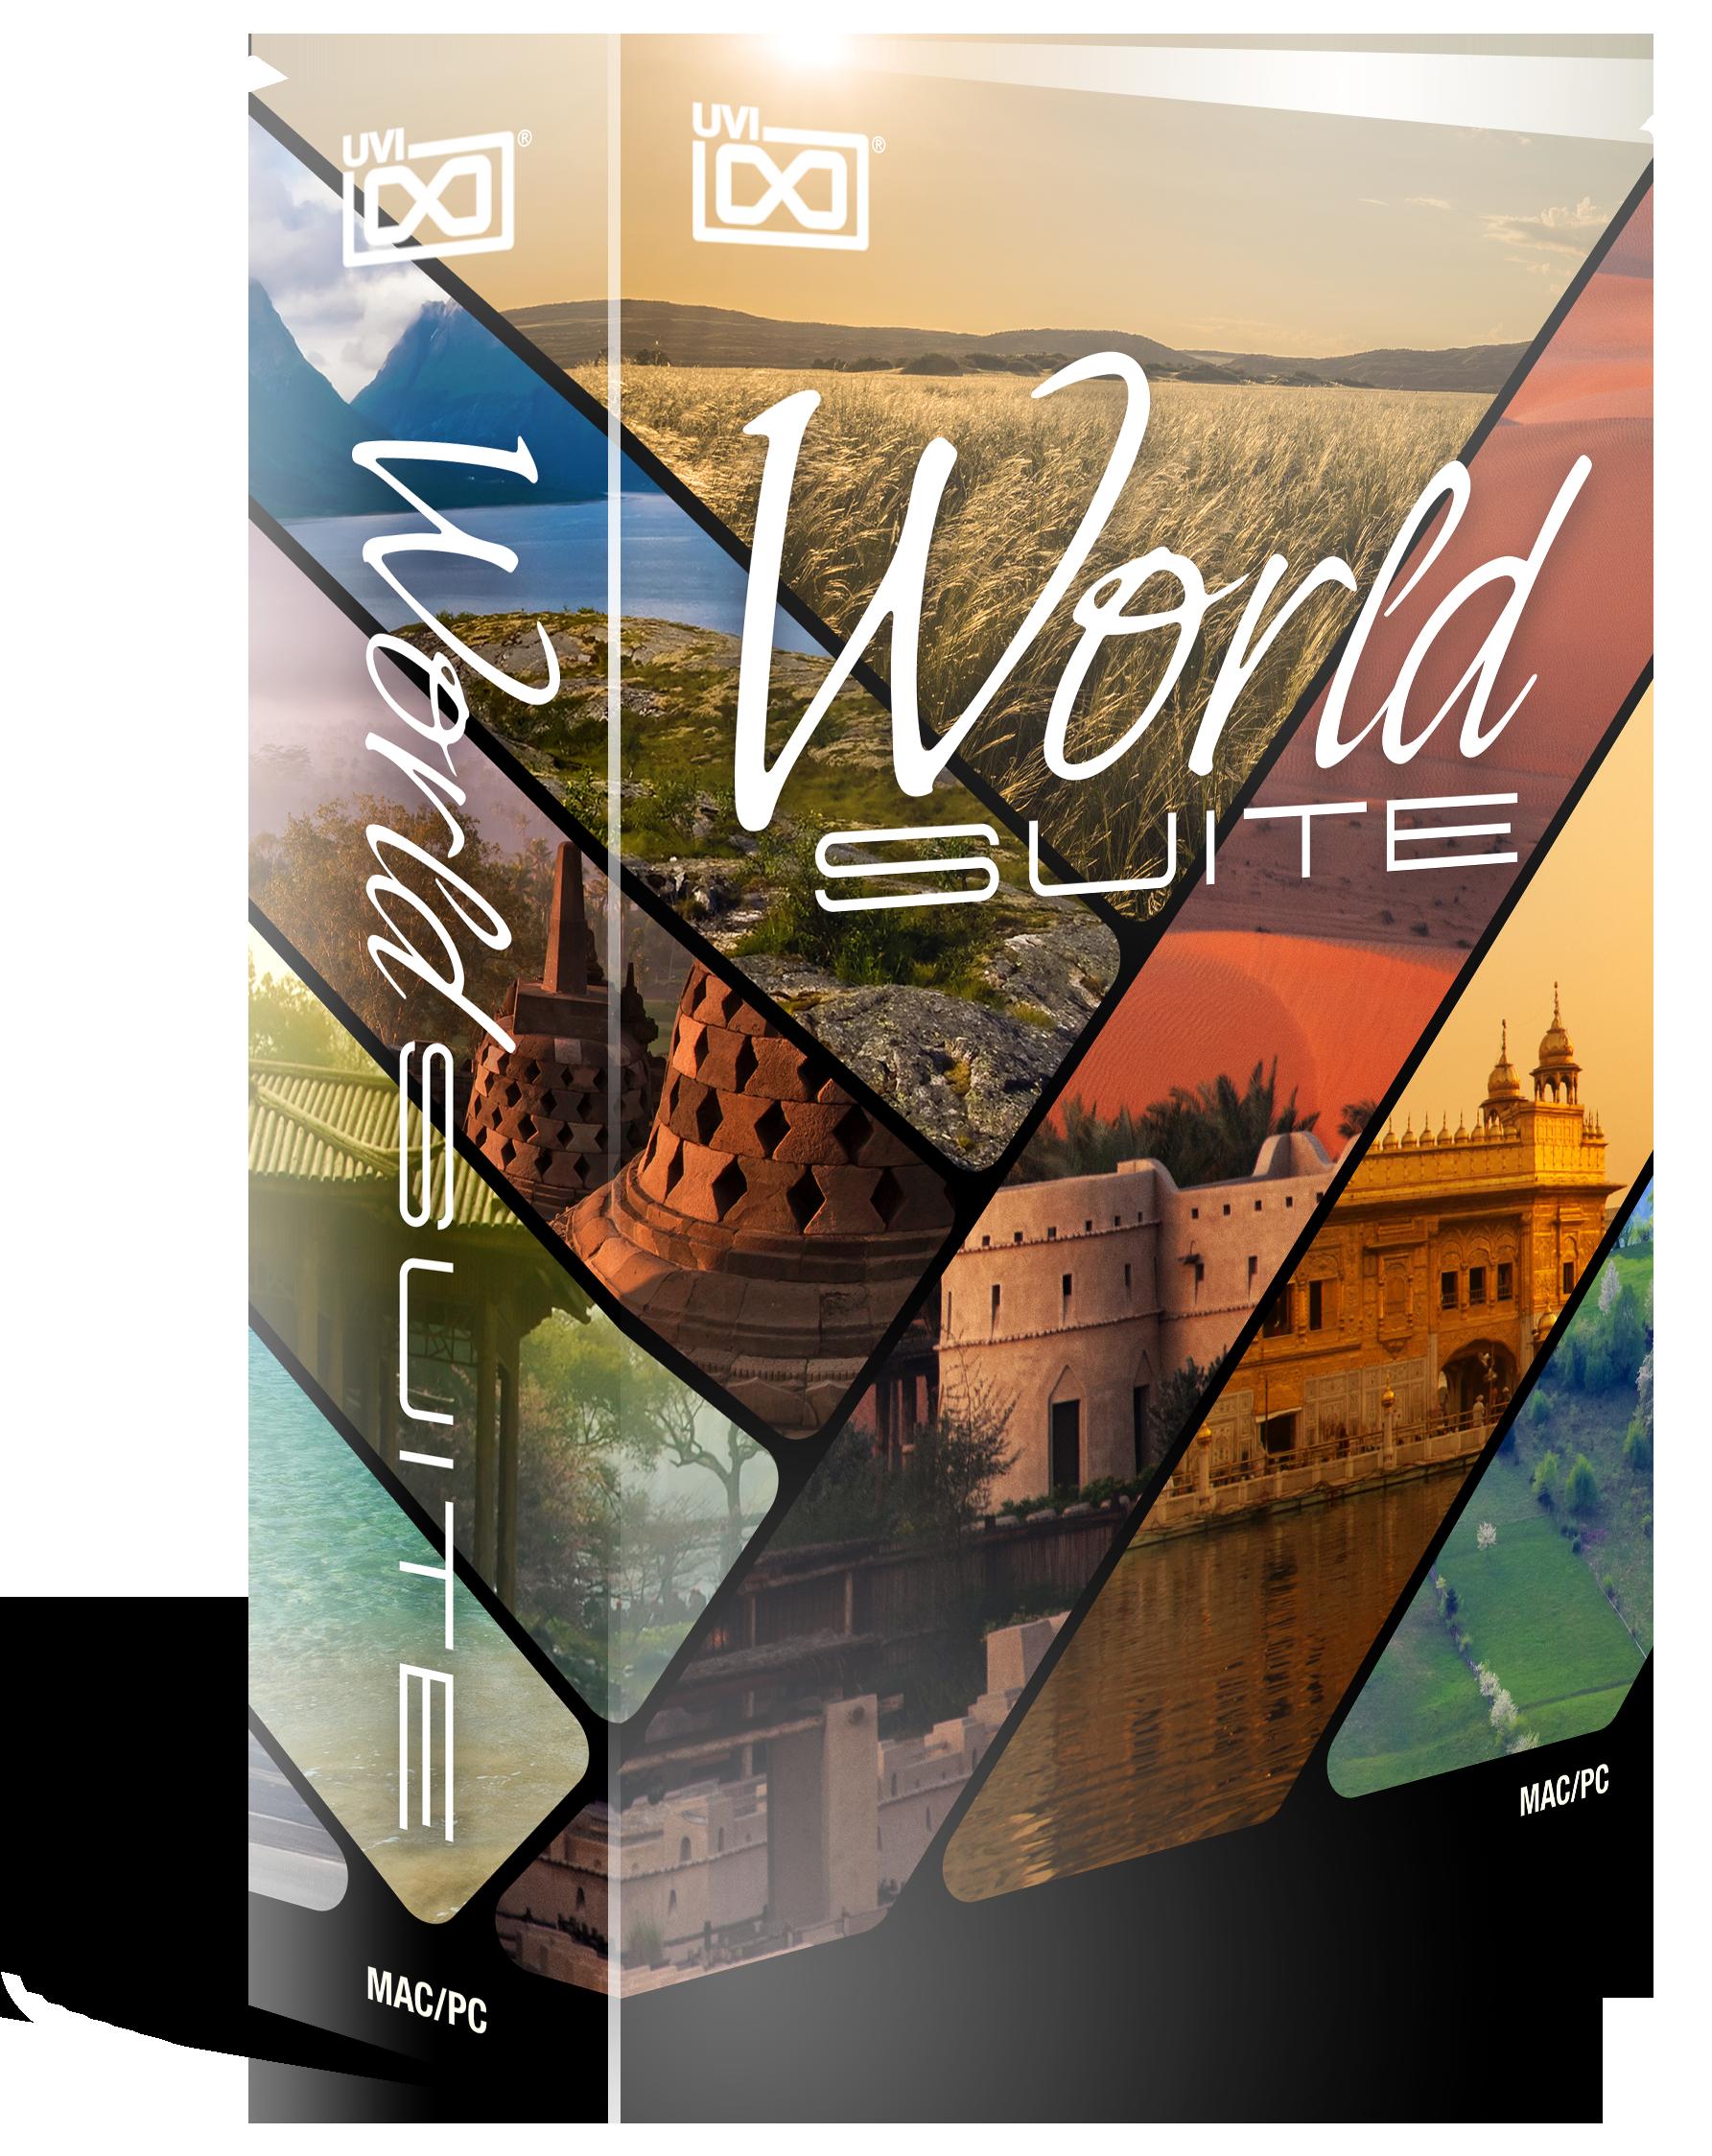 World Suite